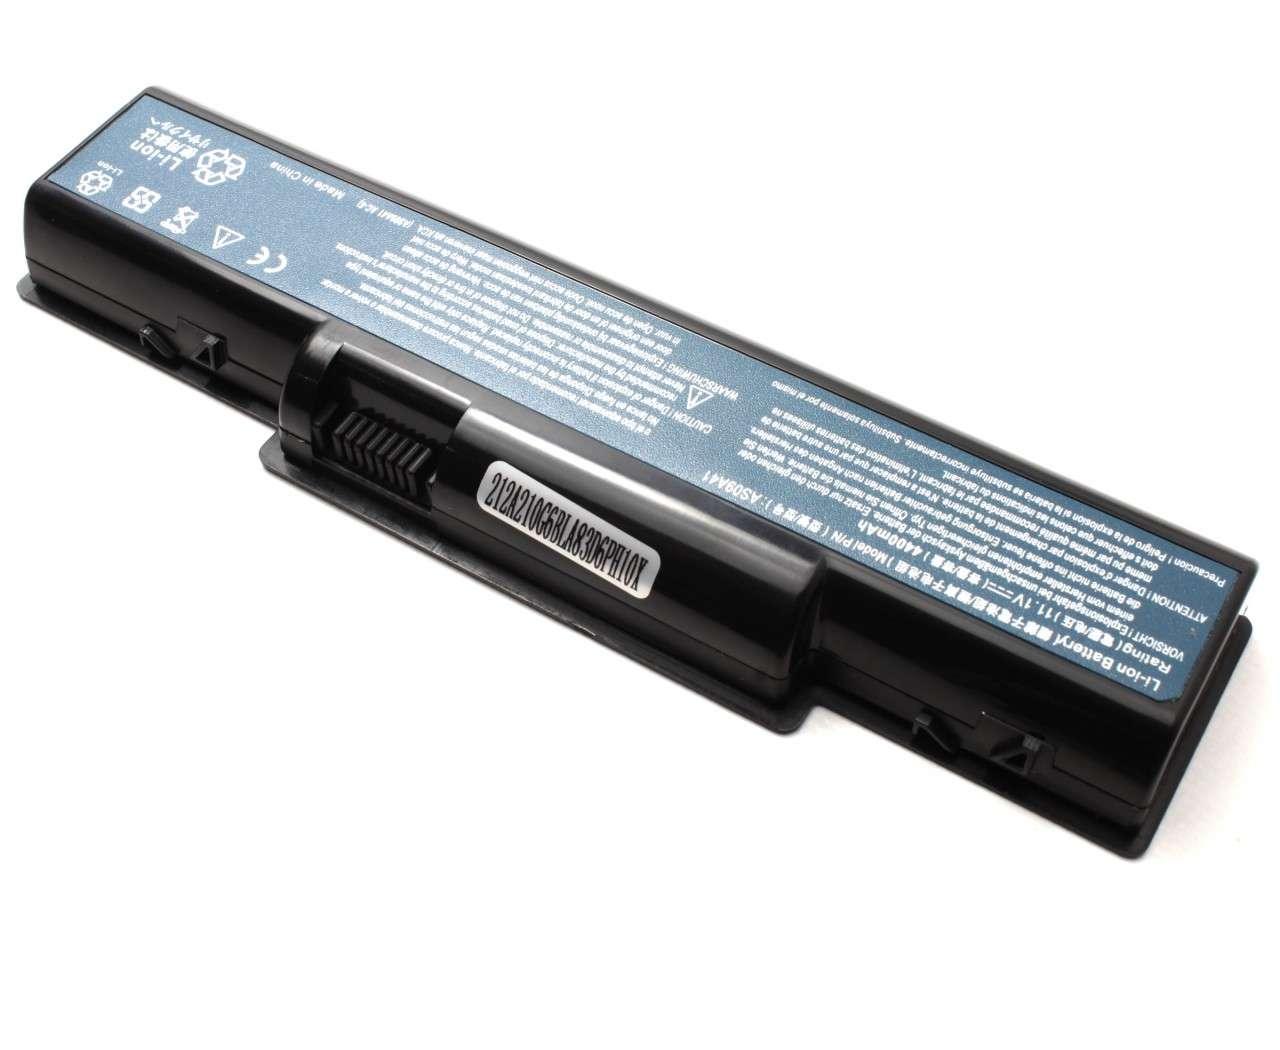 Baterie Packard Bell EasyNote TJ65 Ver.2 imagine powerlaptop.ro 2021